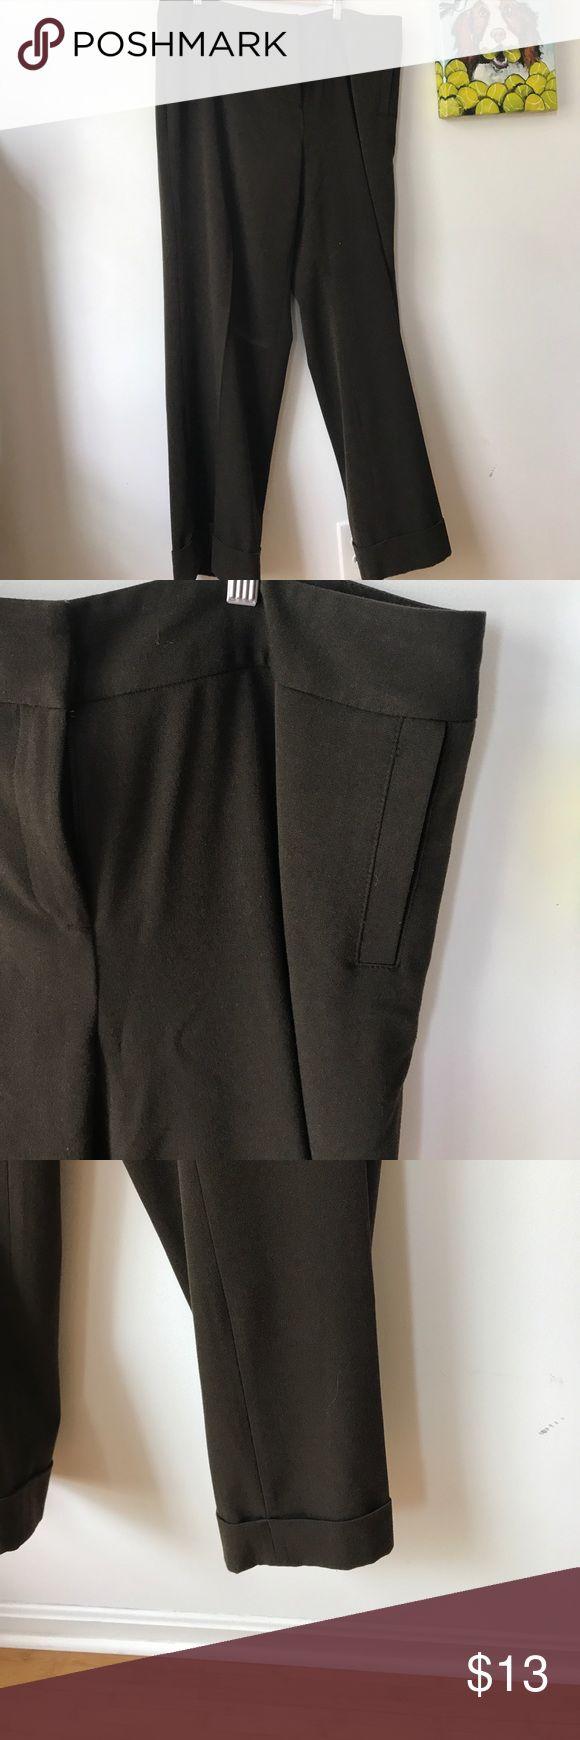 Rafaella Pants Brown Slacks Cuff Leg Medium Brown Slacks with cuffed ankles and straight cut pockets. Rafaella Pants Trousers